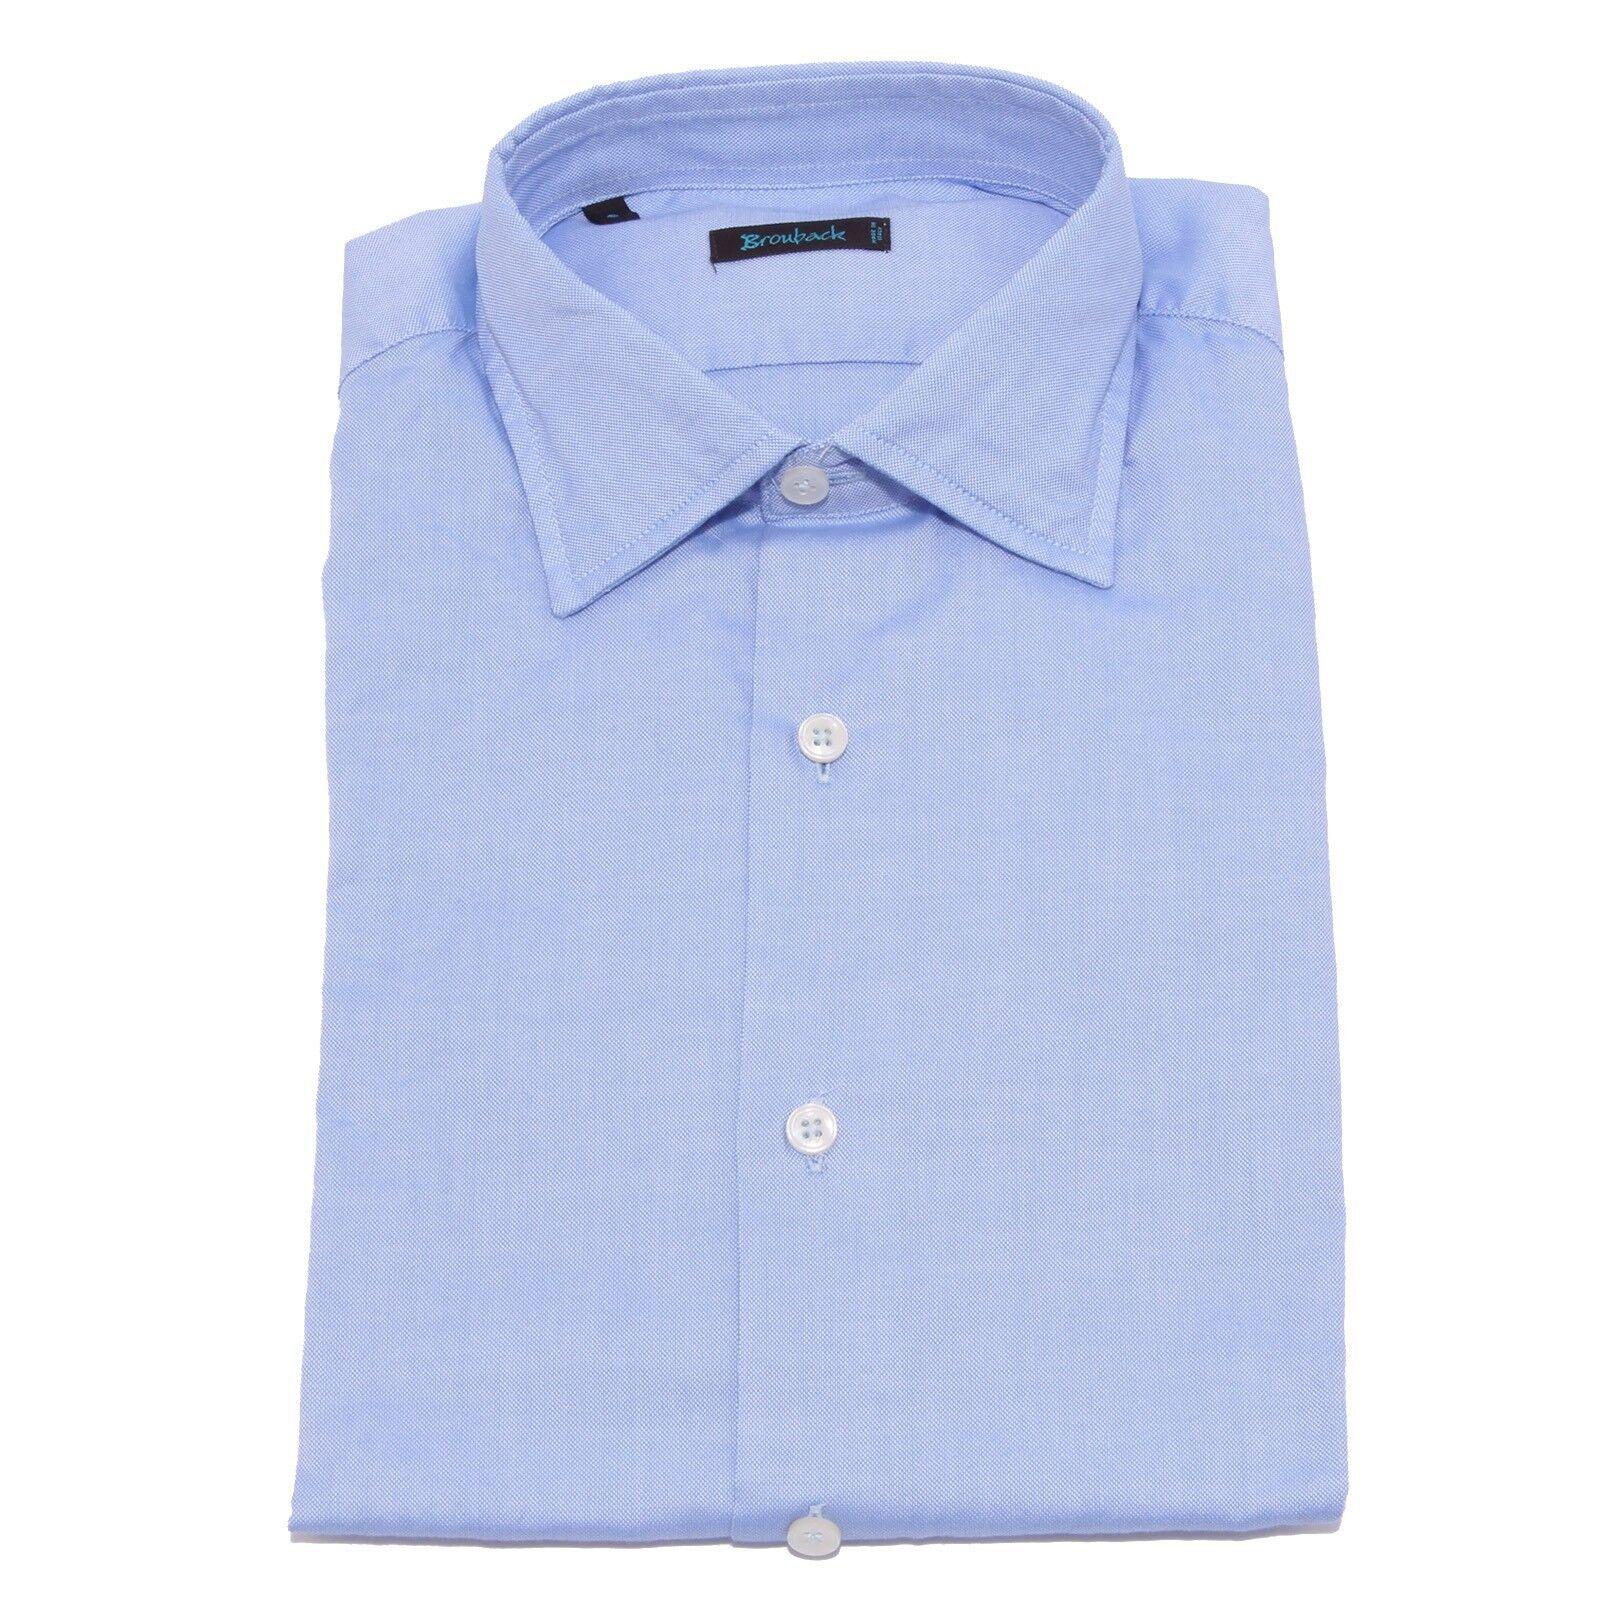 4276V camicia uomo BROUBACK WASHED blu shirt men